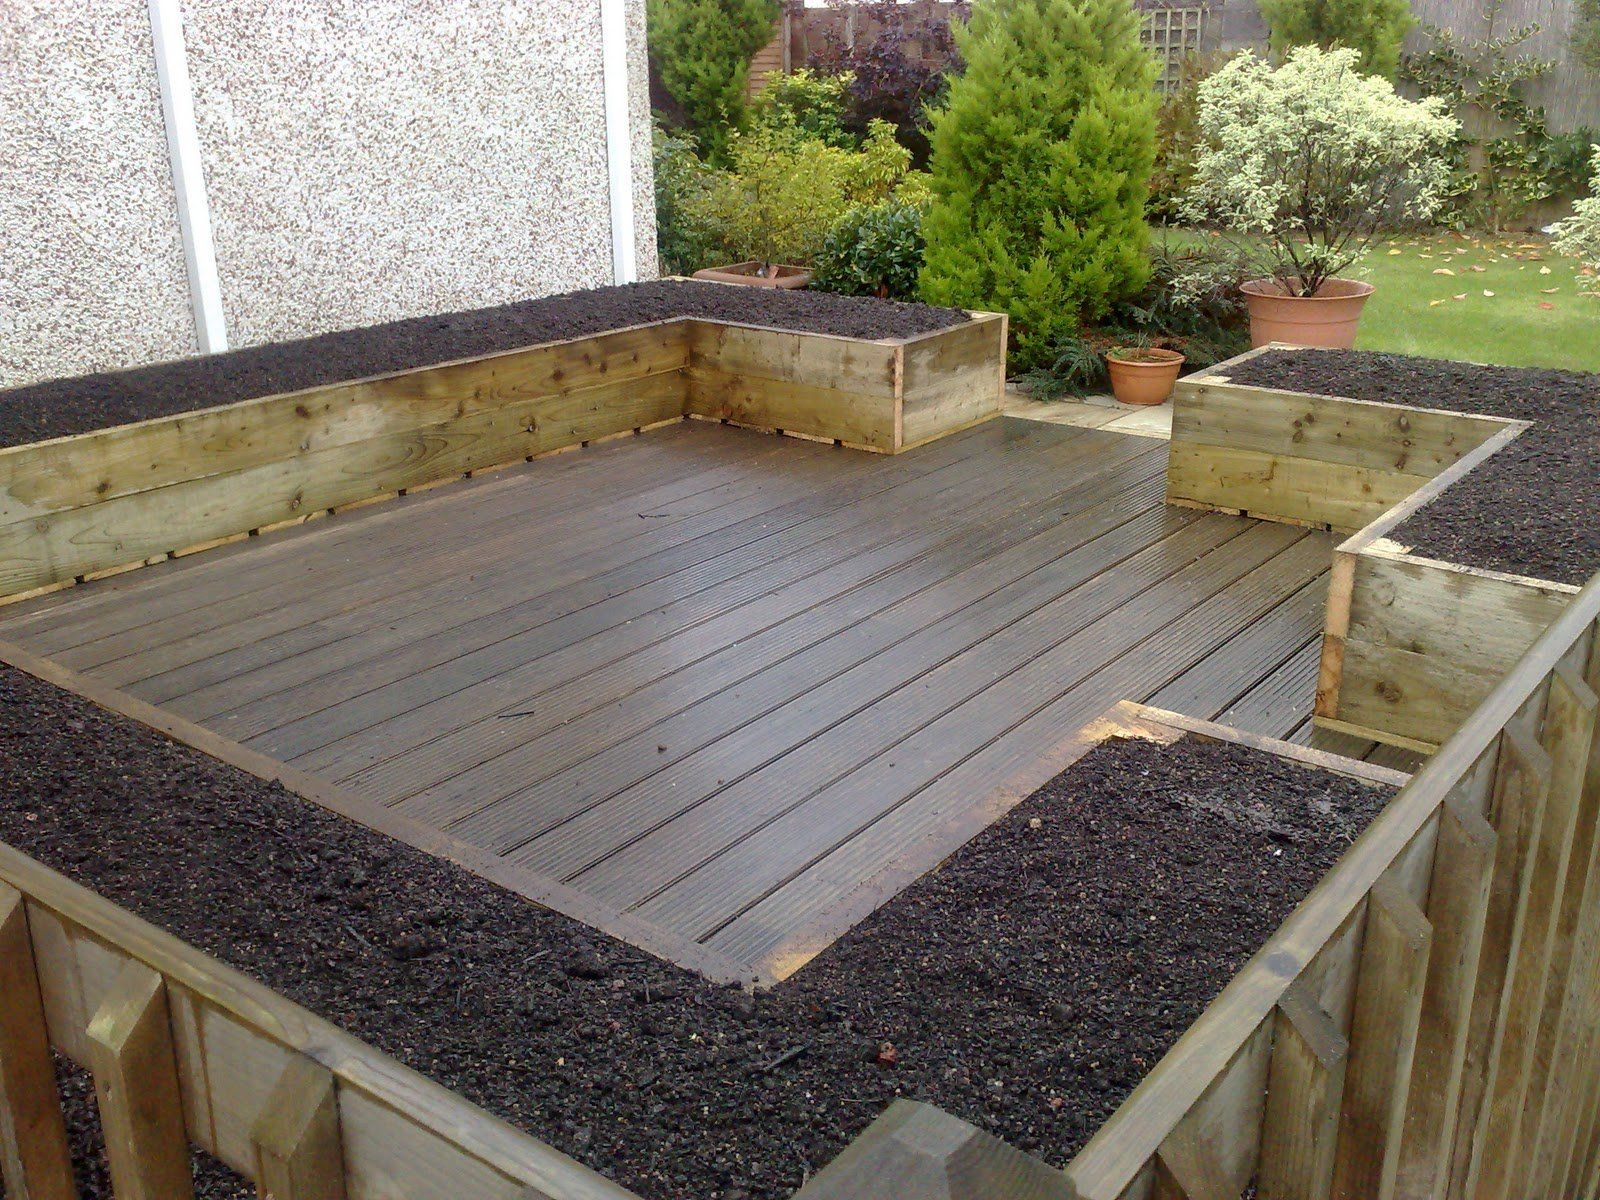 Garden And Patio Deck And Patio With Hardwood Floor Tiles